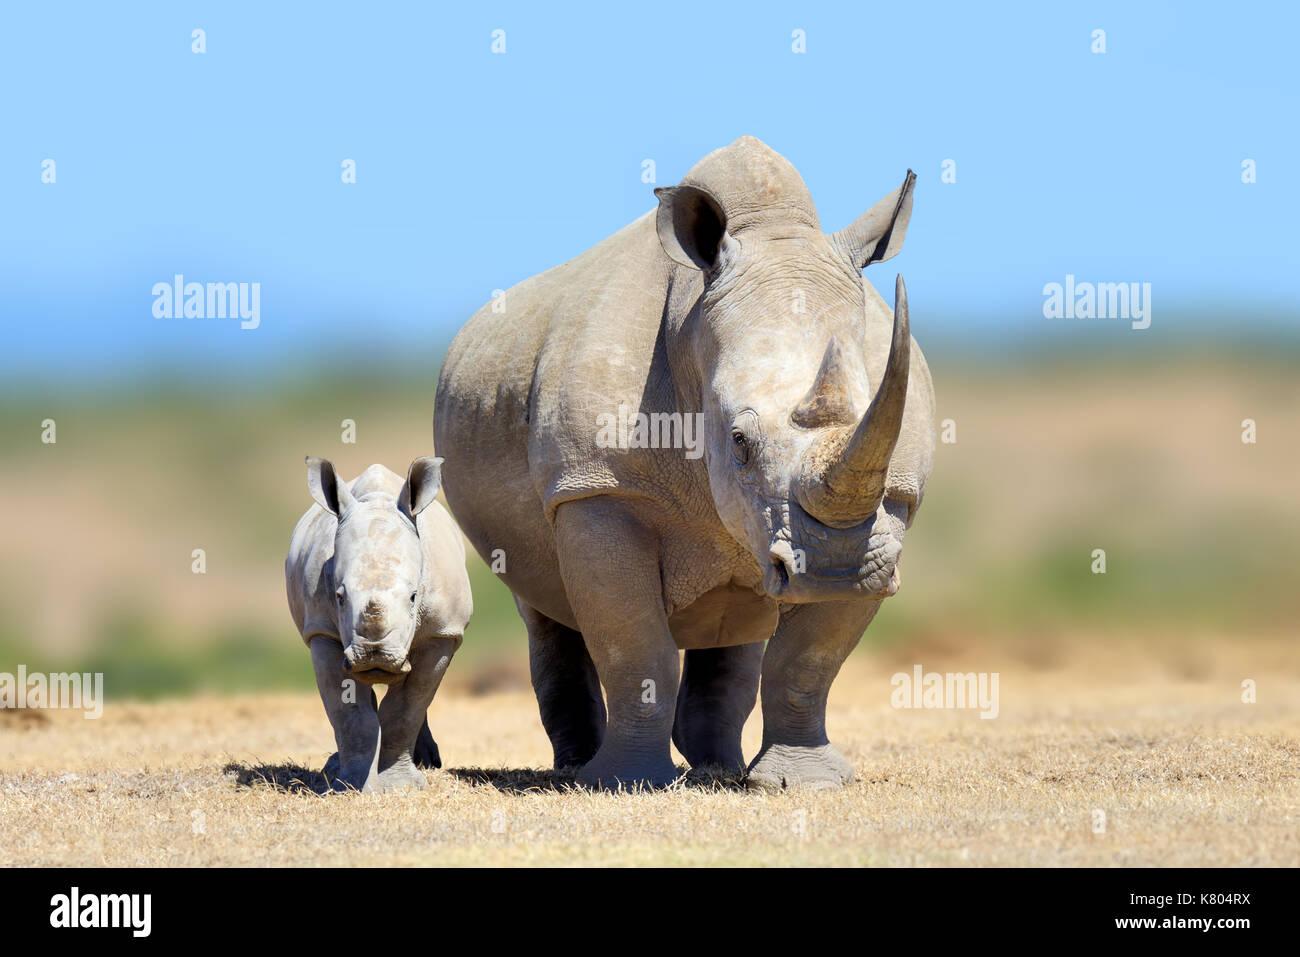 Rinoceronte bianco in natura habitat, Kenya, Africa. wildlife scena dalla natura. grosso animale da afrika Immagini Stock